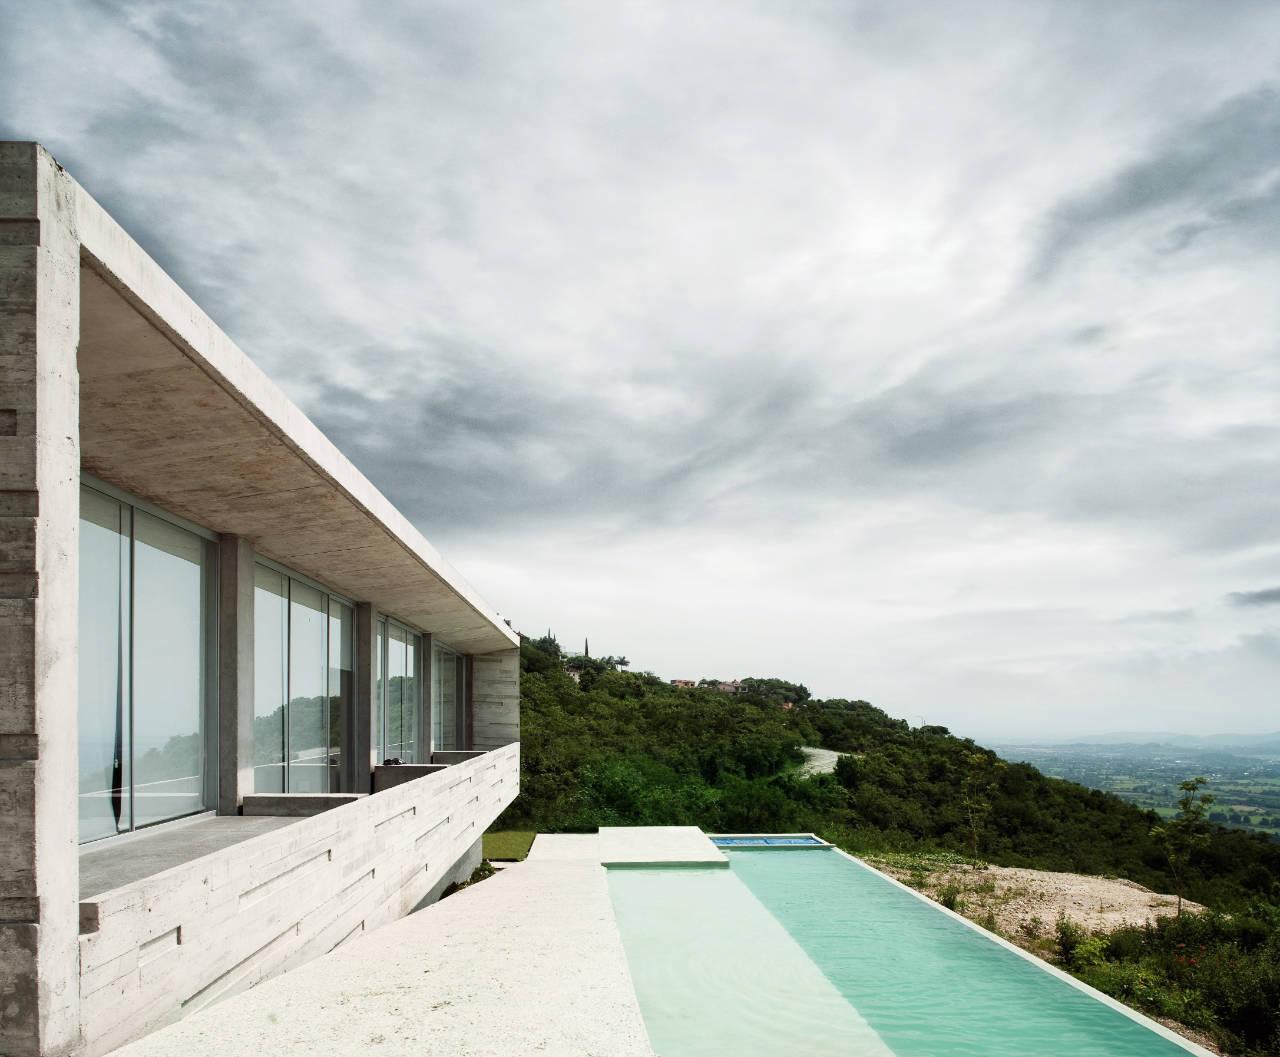 Casa Widescreen / RZERO, © Pedro Iriart